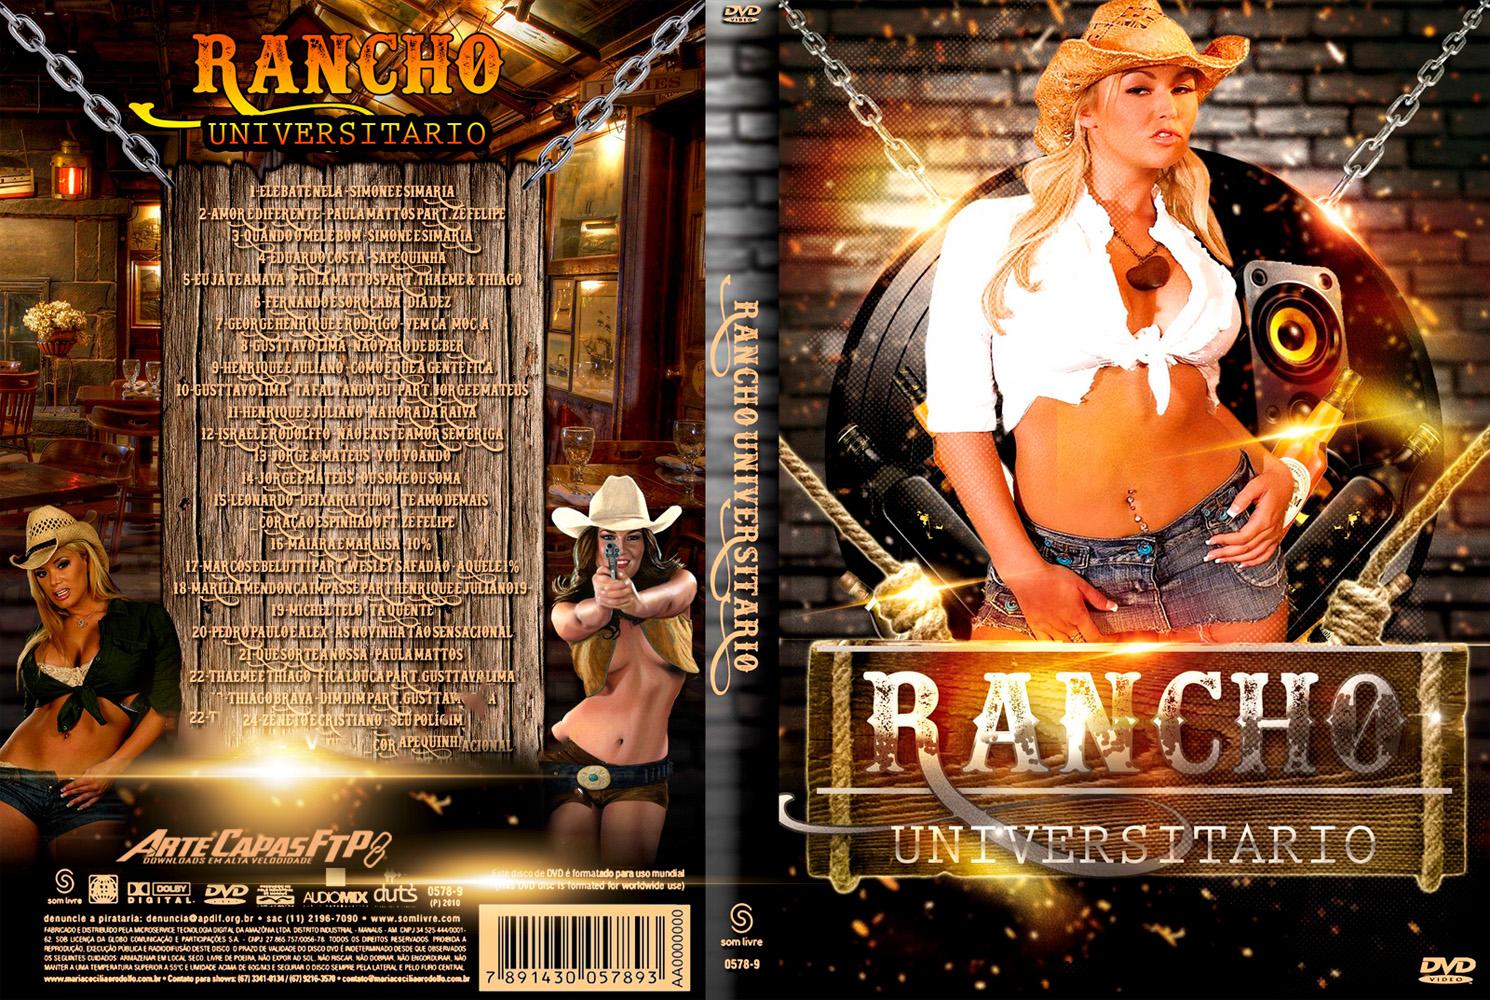 Rancho Universitário 2016 DVDRip + DVD-R Rancho 2BUniversit 25C3 25A1rio 2B2016 2B  2BXANDAODOWNLOAD